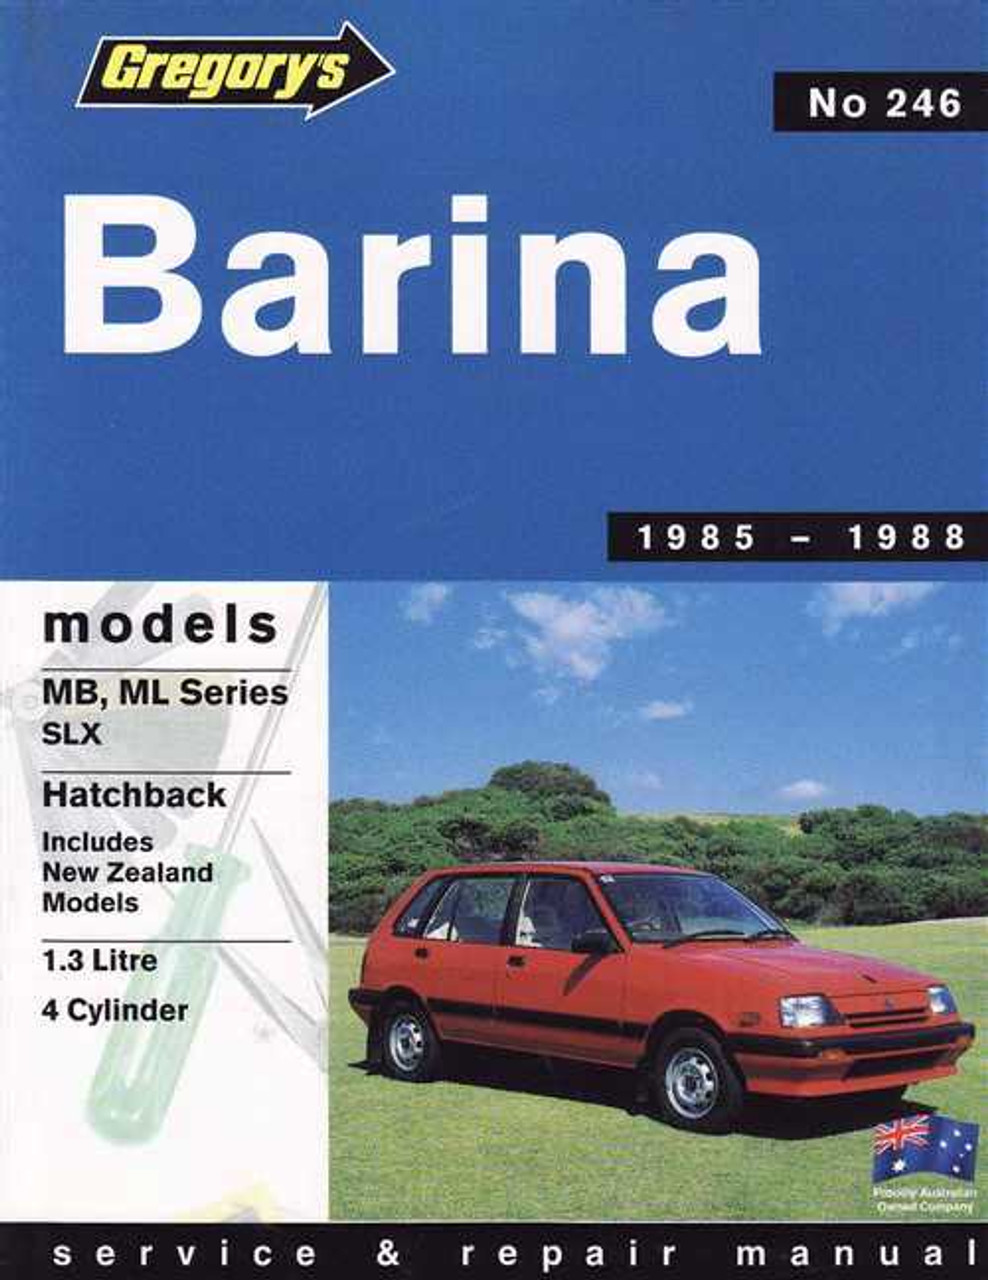 holden barina 1985 1988 workshop manual rh automotobookshop com au 1985 Holden Barina 2013 Holden Barina